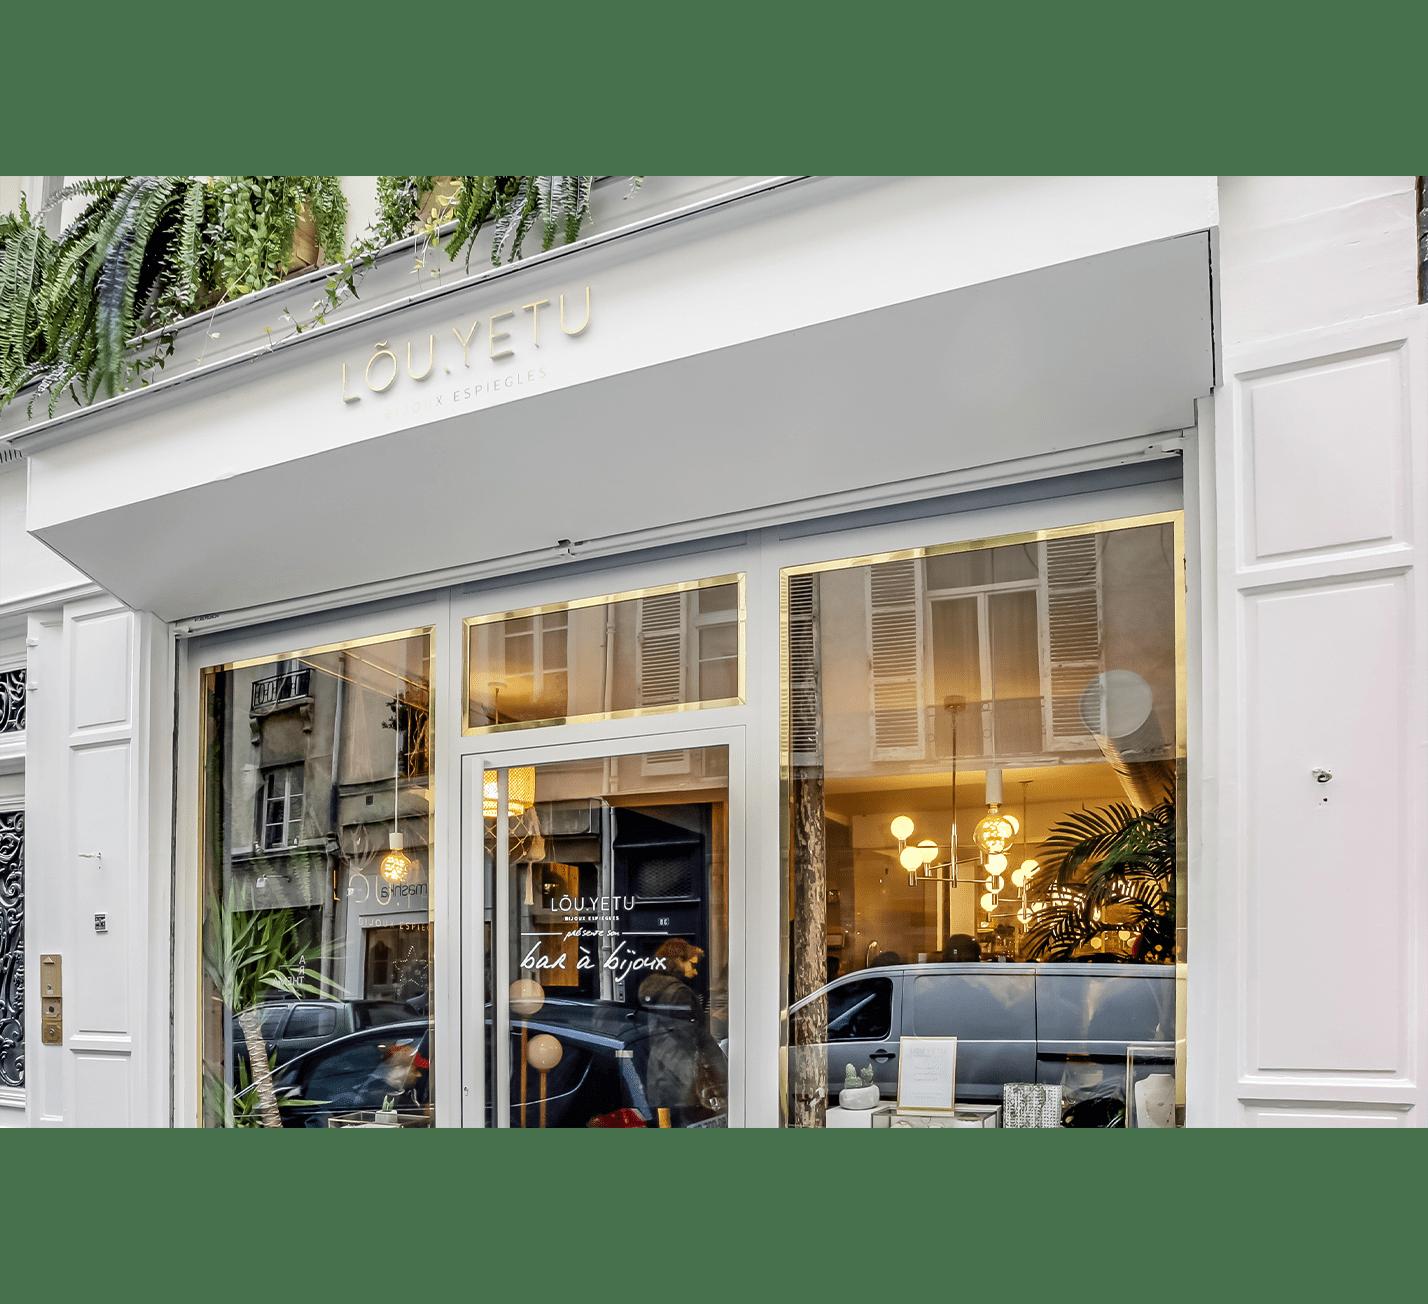 Projet-Lou-Yetu-Atelier-Steve-Pauline-Borgia-Architecture-interieur-01-min